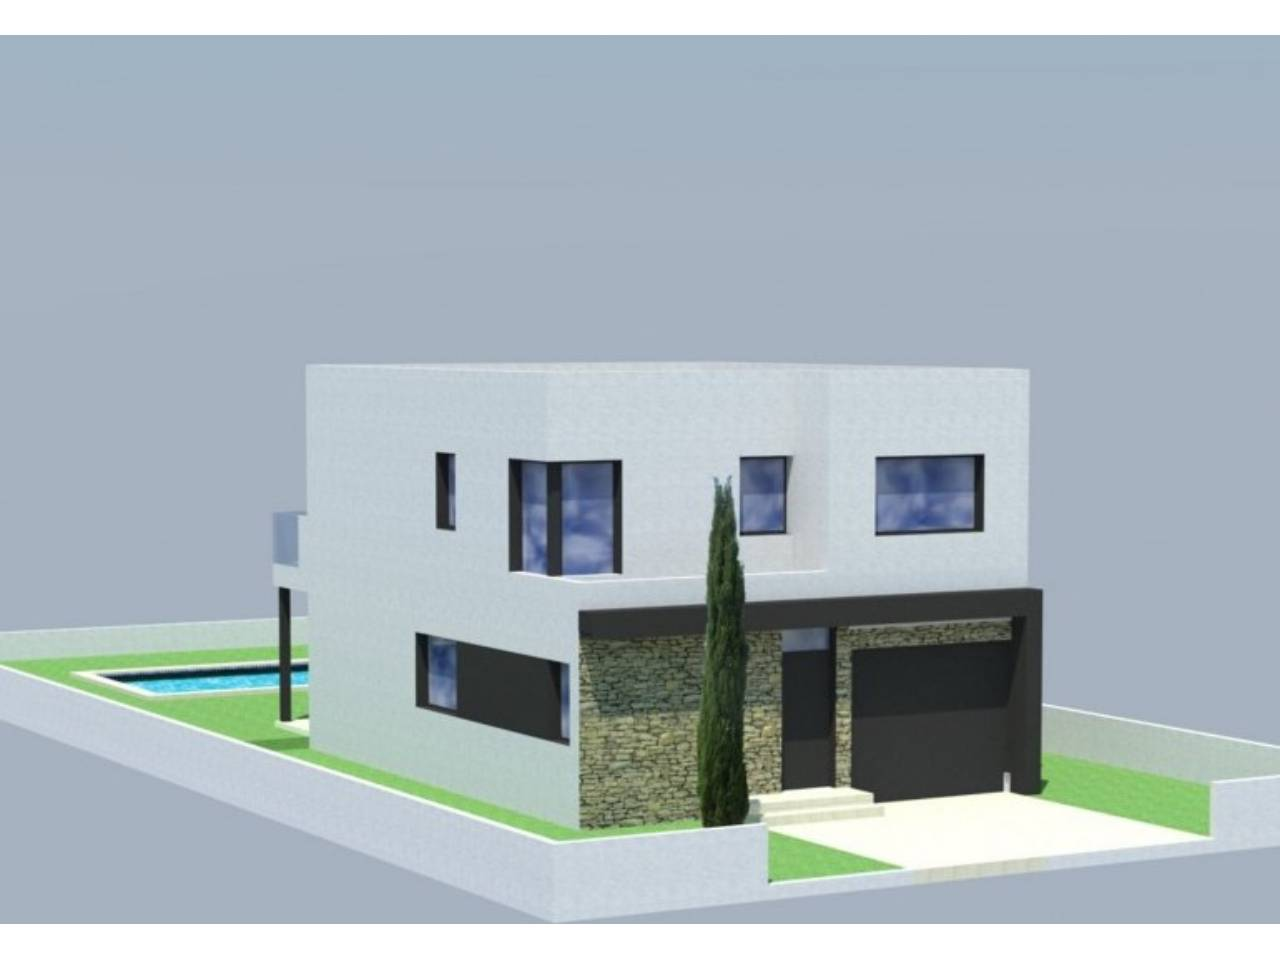 060247 - GARRIGUELLA House model REQUESENS